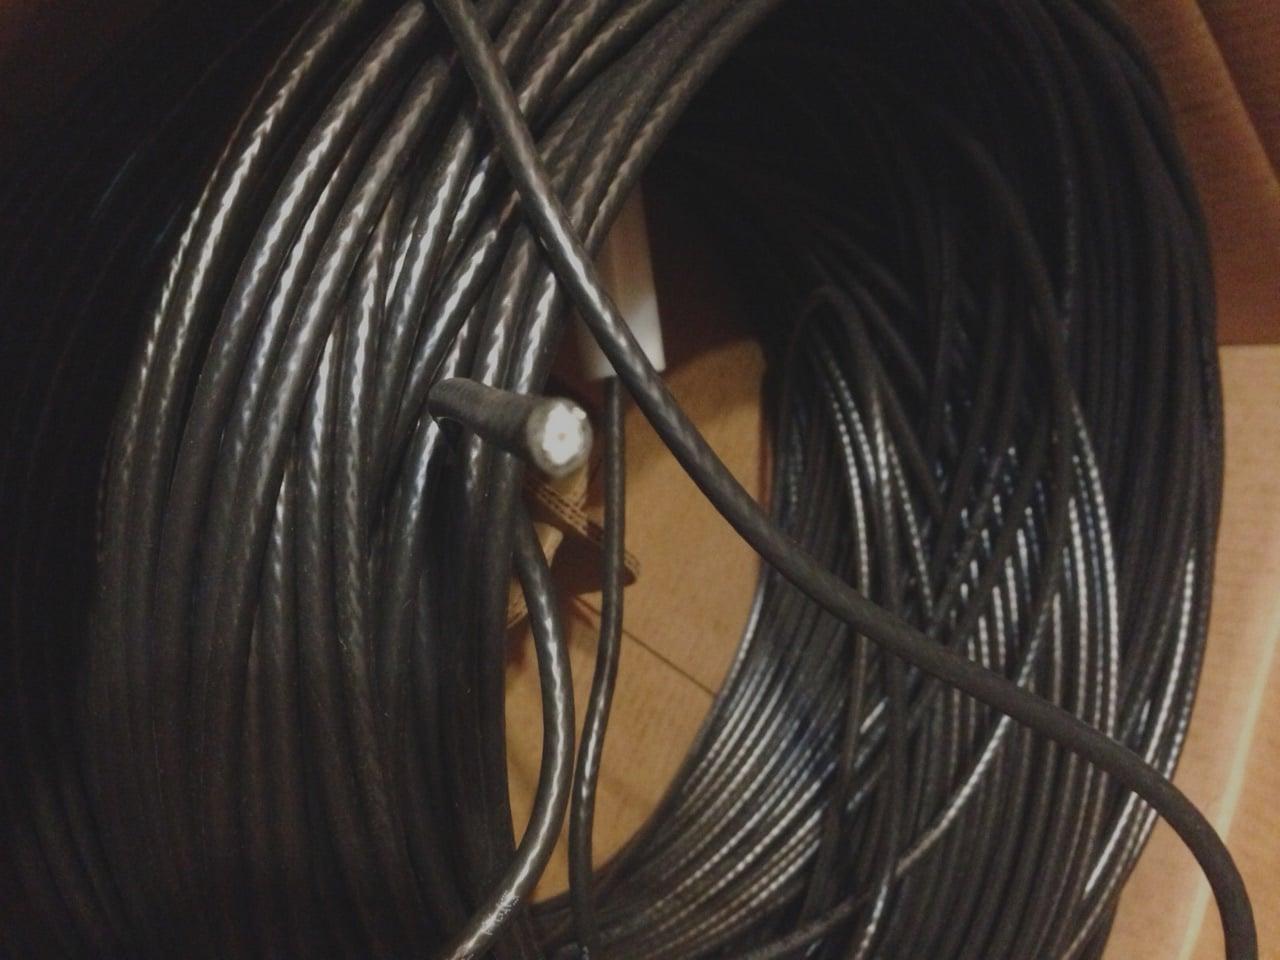 CommScope Community Antenna Television Coax Wire